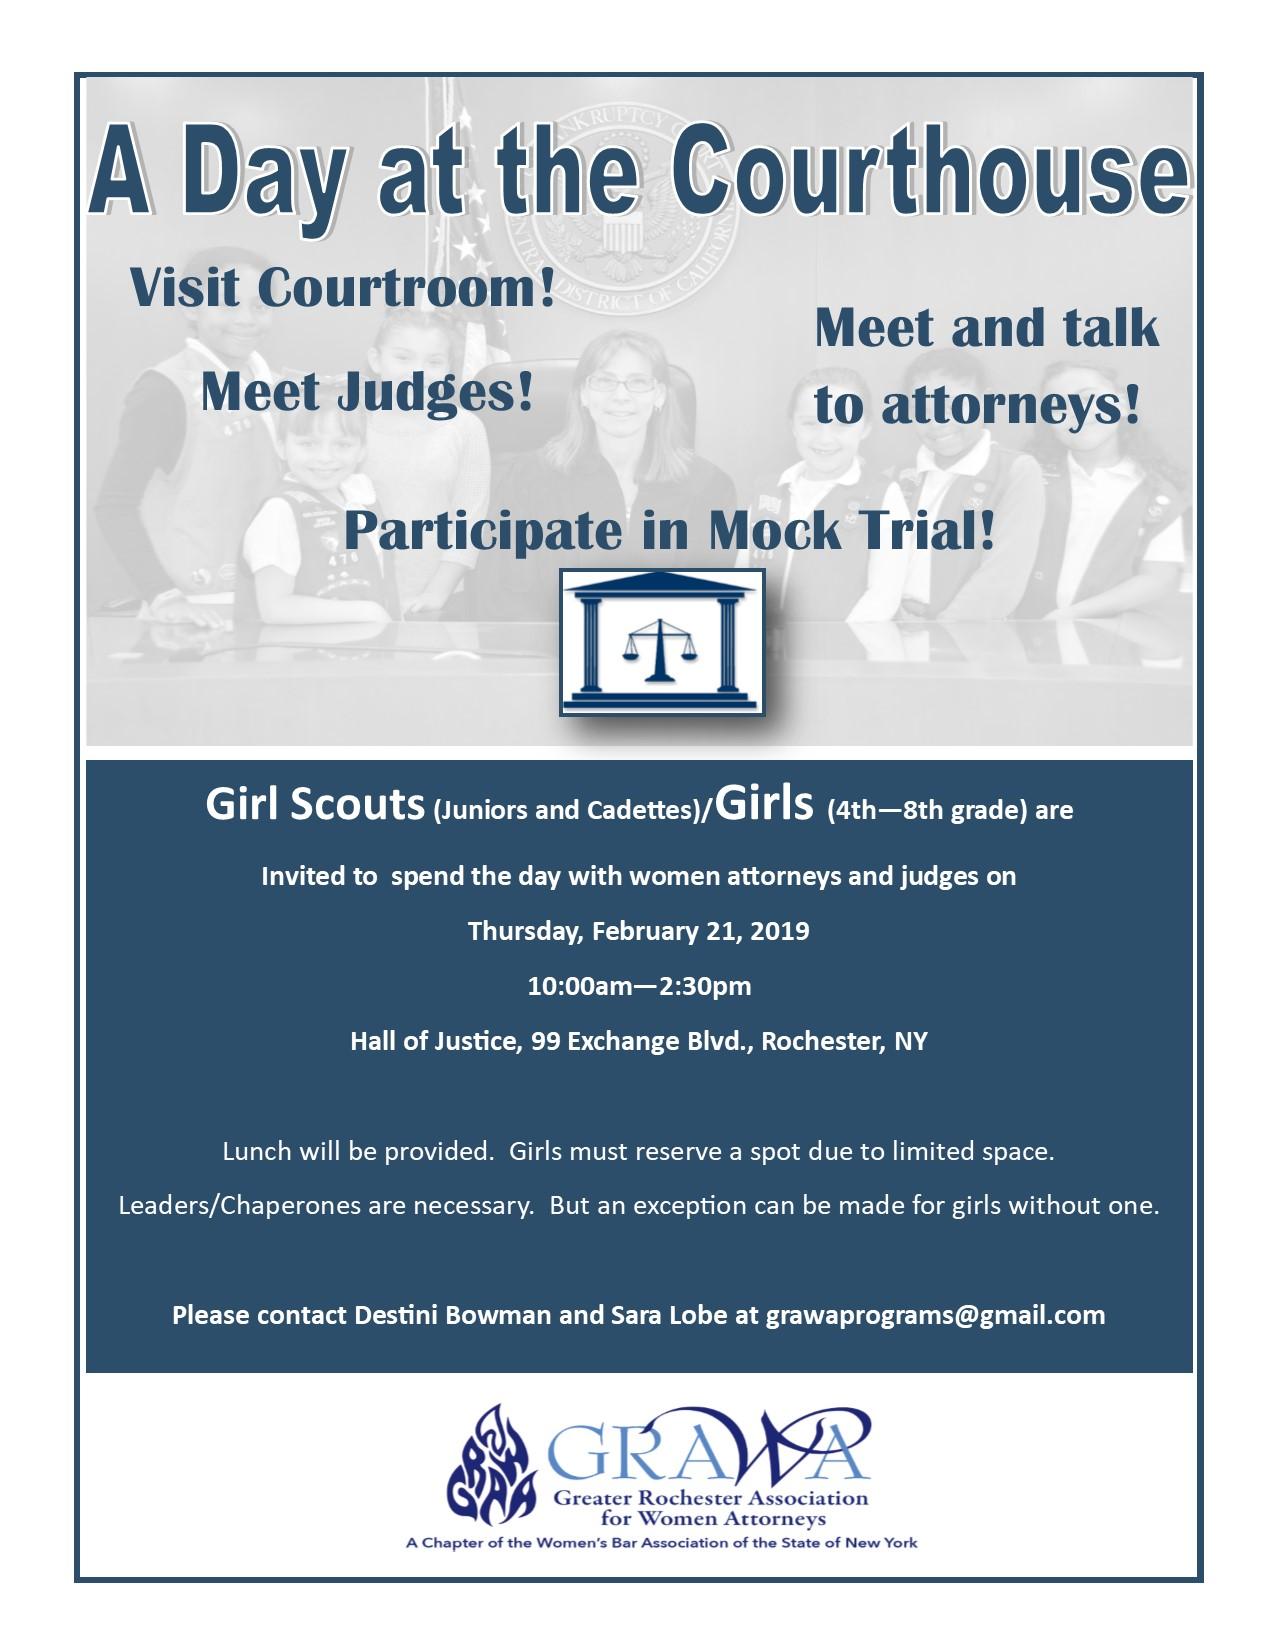 GRAWA Courthouse Flyer (2).jpg